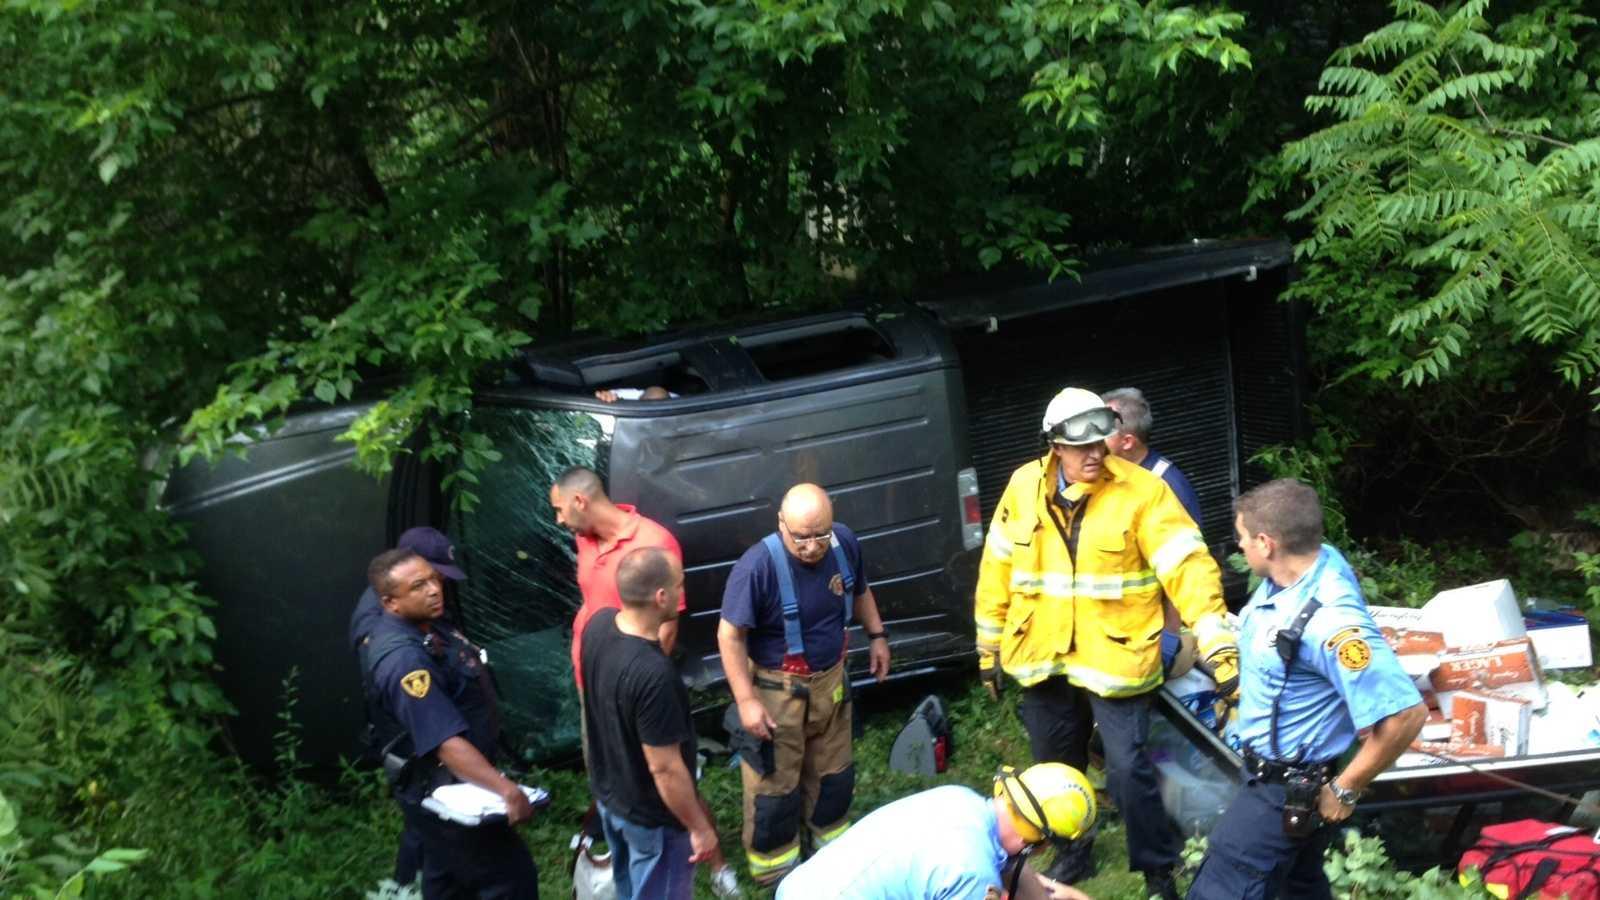 img-Brookline truck crash